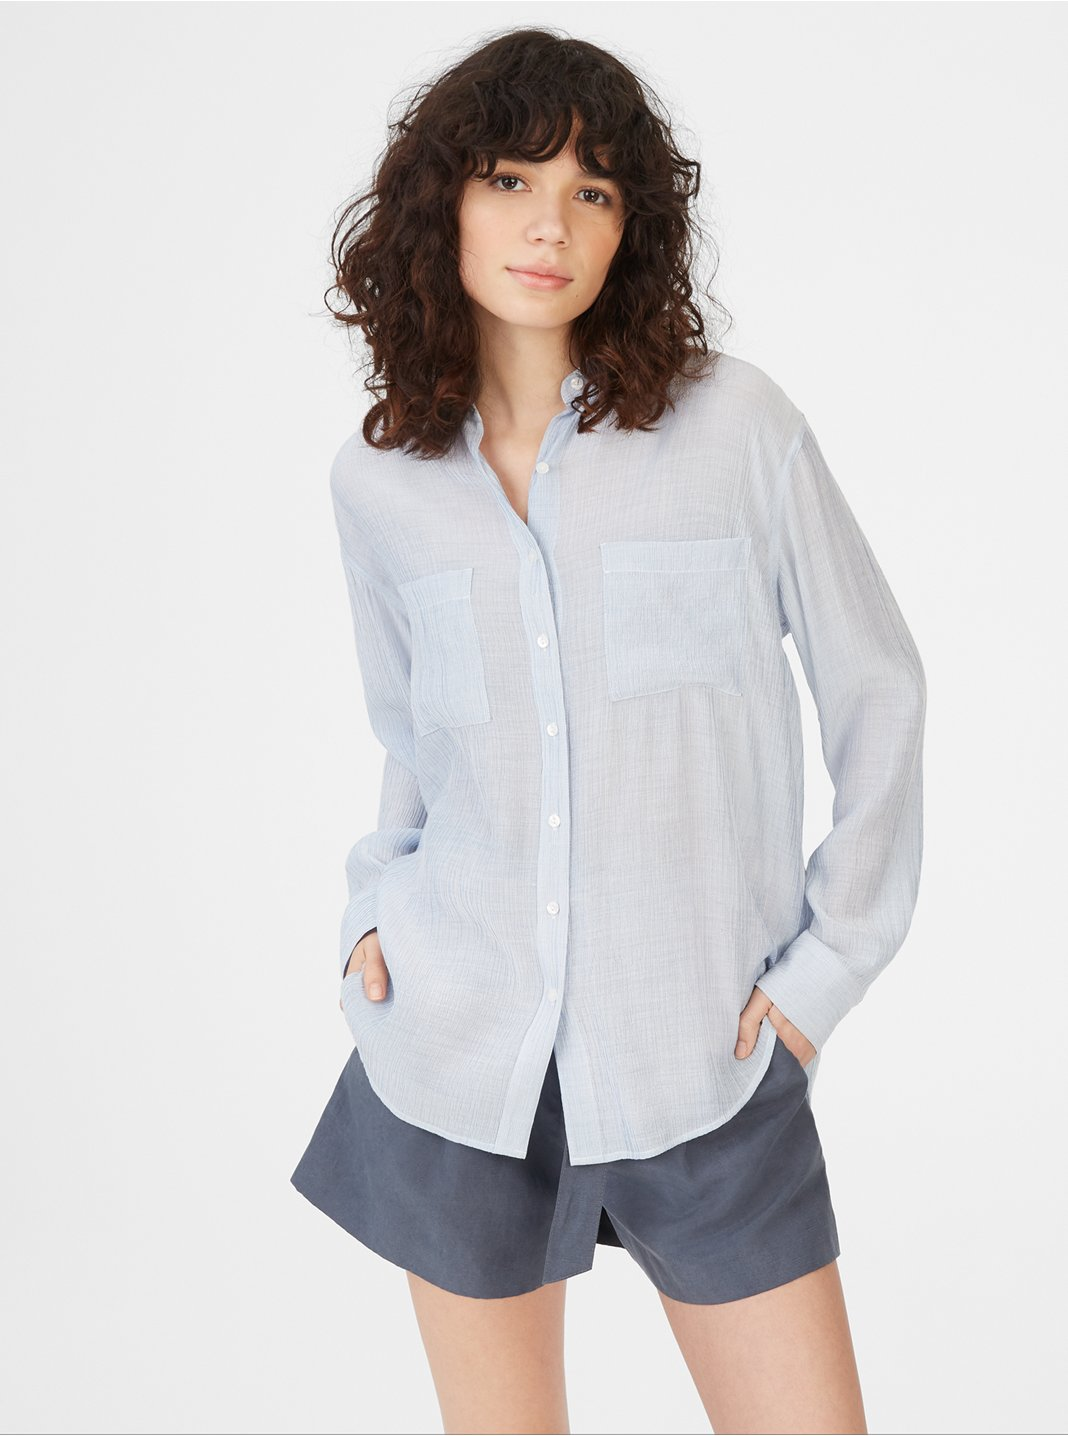 fc48eed164ad6a Claudia Shirt. EXTRA 30% OFF